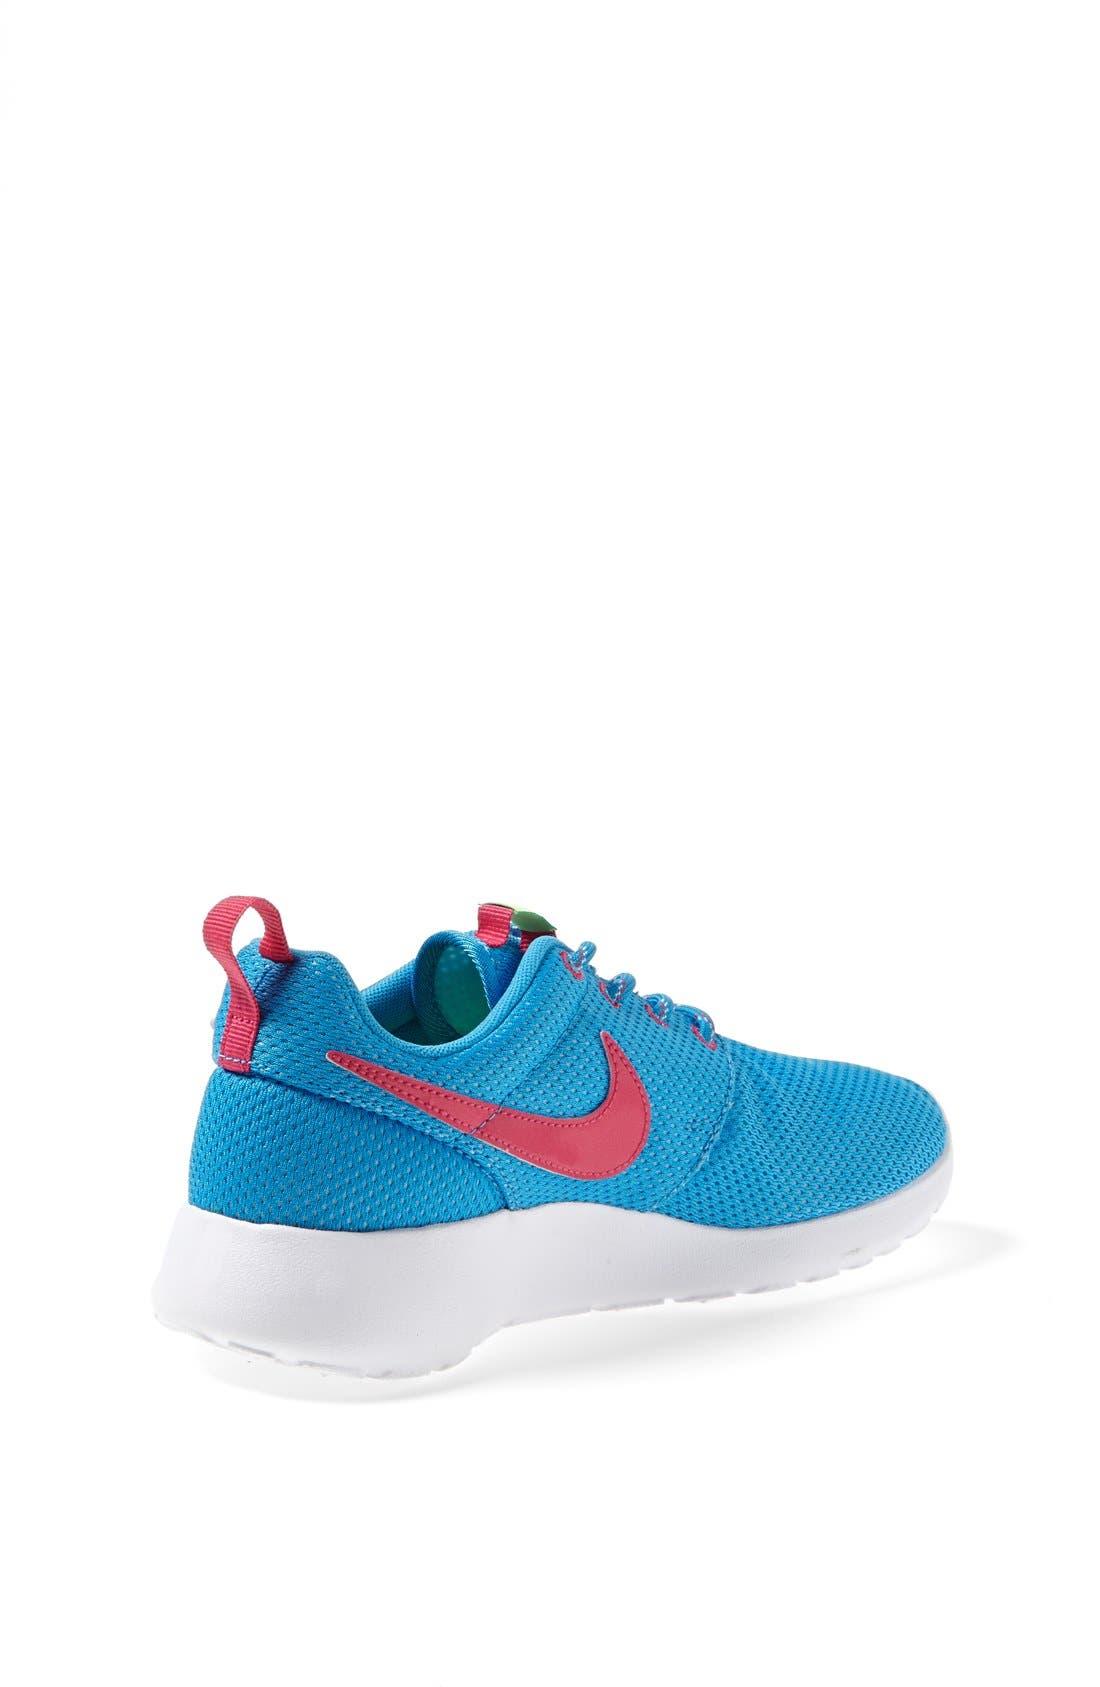 'Roshe Run' Athletic Shoe,                             Alternate thumbnail 164, color,